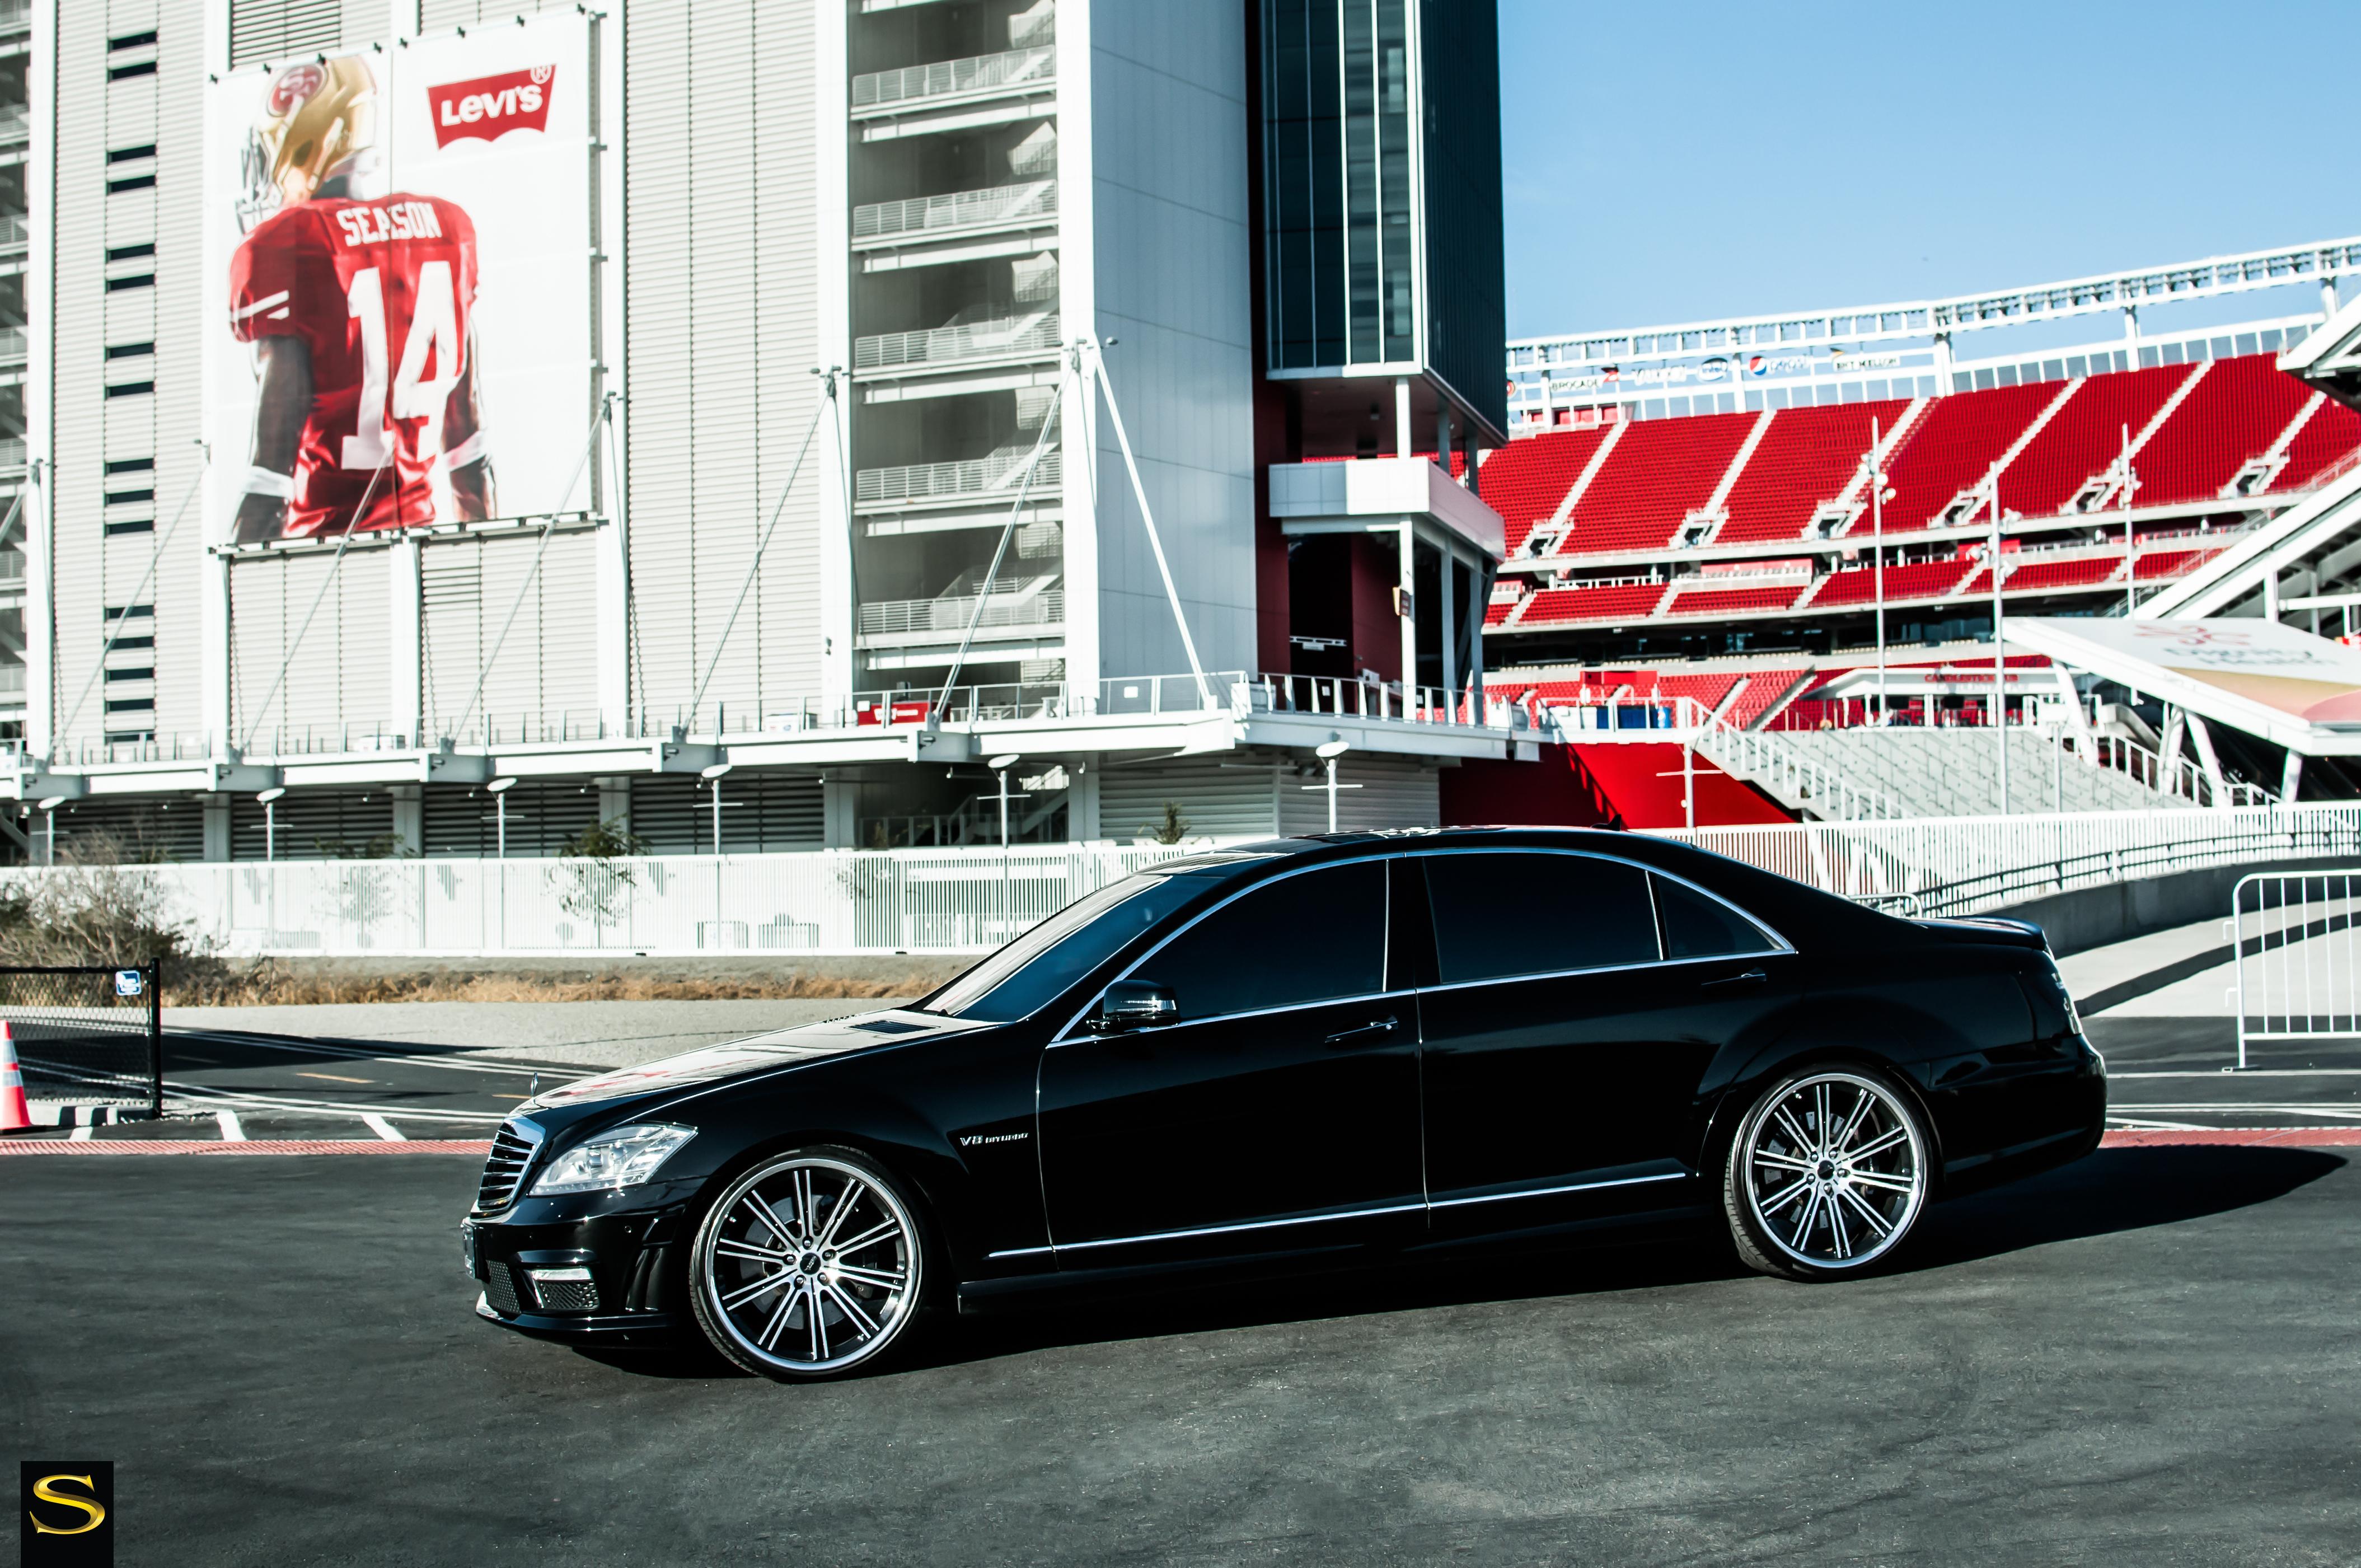 Black-California-Wheels-Mercedes-Benz-S63-Saini-Wheels-Black di-Forza-BM3-Machined-Black-Stainless-Steel-11